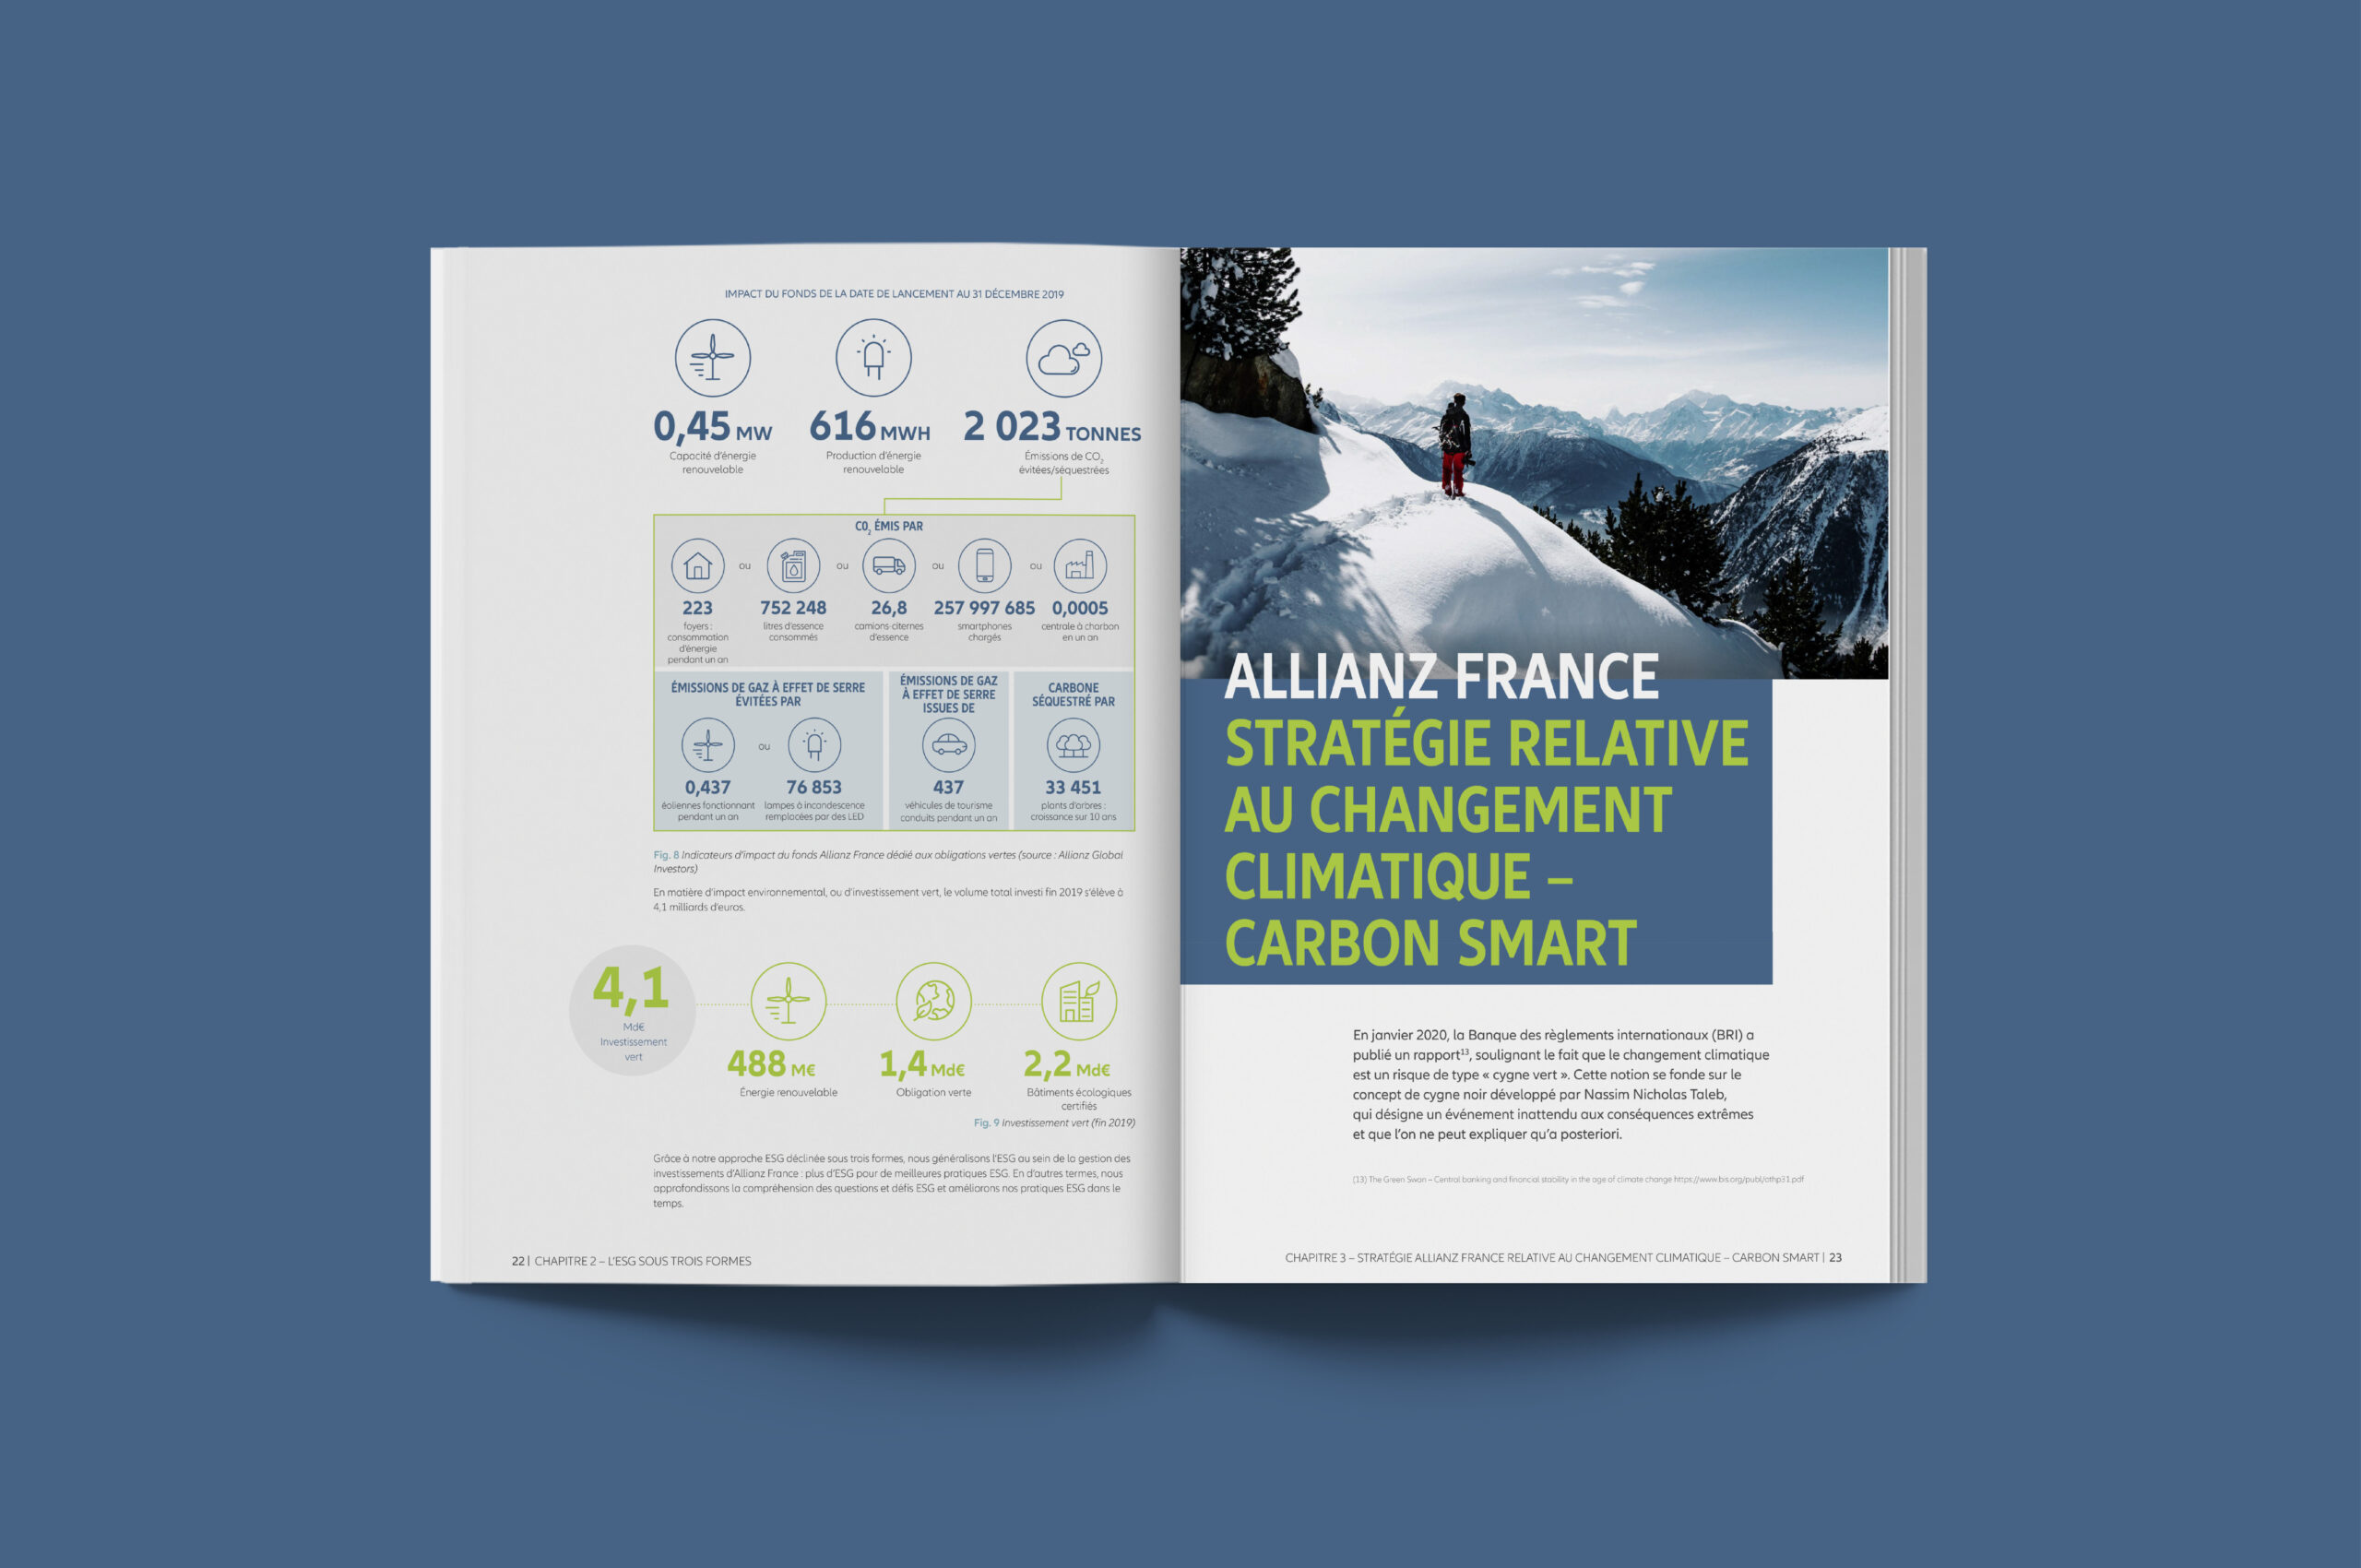 Rapport investissement durable allianz 6